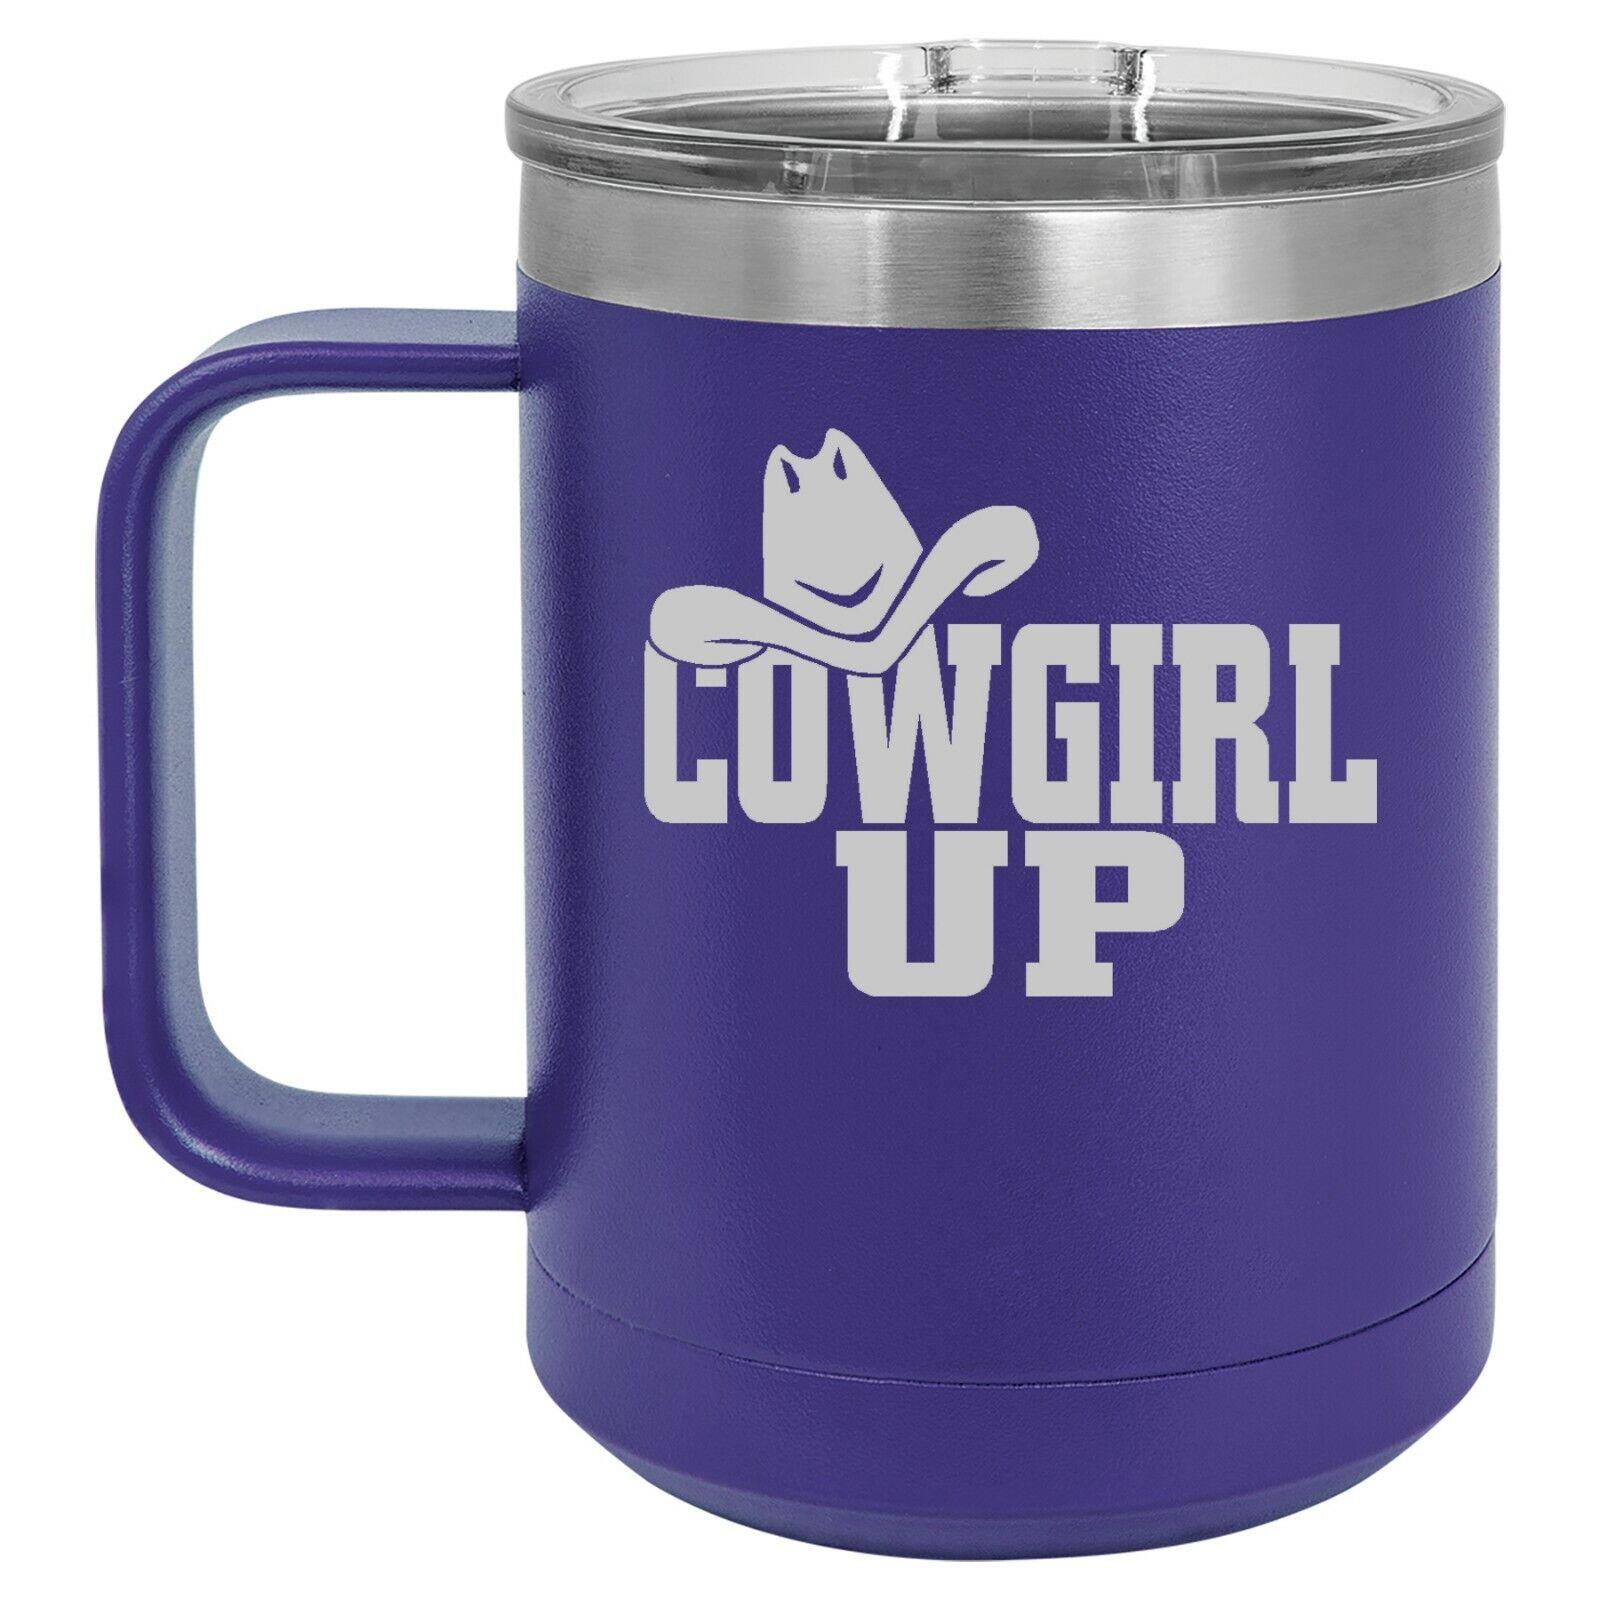 15oz Tumbler Coffee Mug Handle & Lid Travel Cup Insulated Co